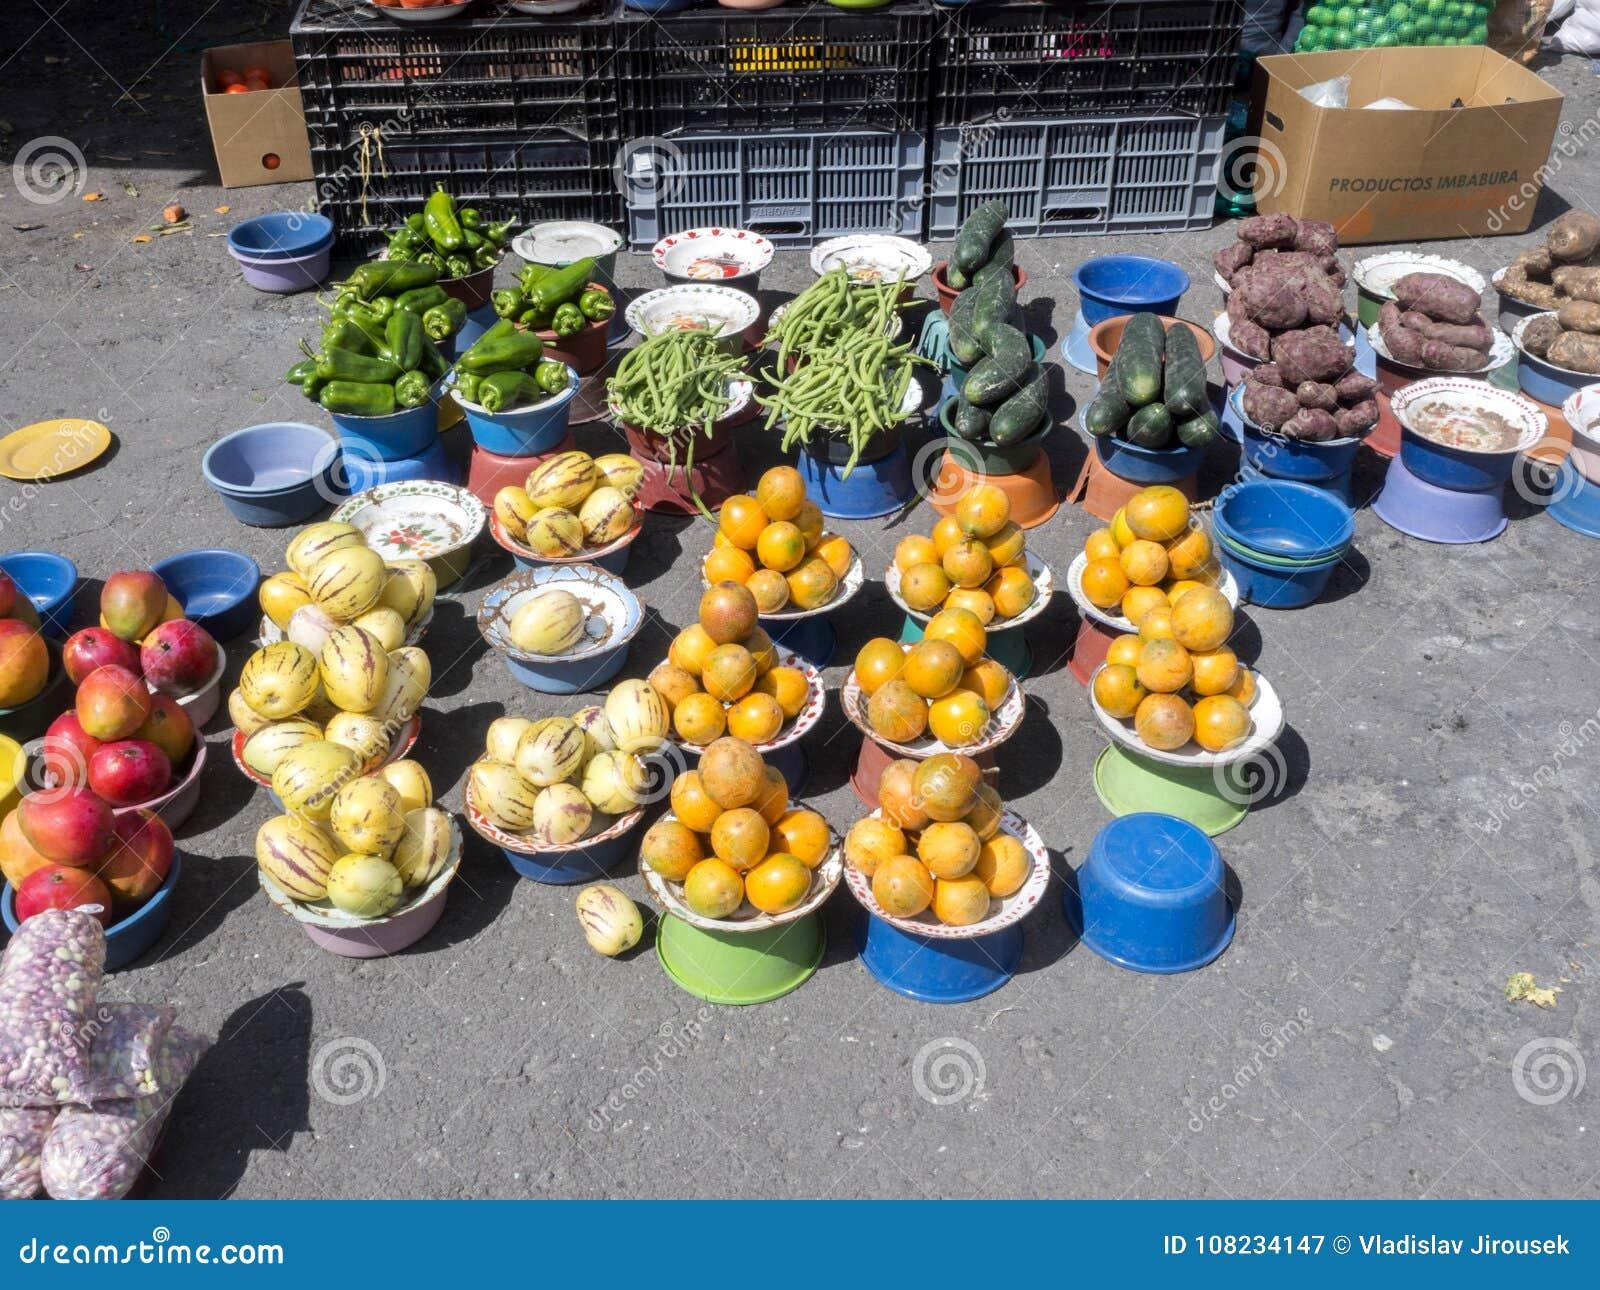 Bogata oferta owoc, warzywa i mięsa, Quito rynek, Quito, Ekwador